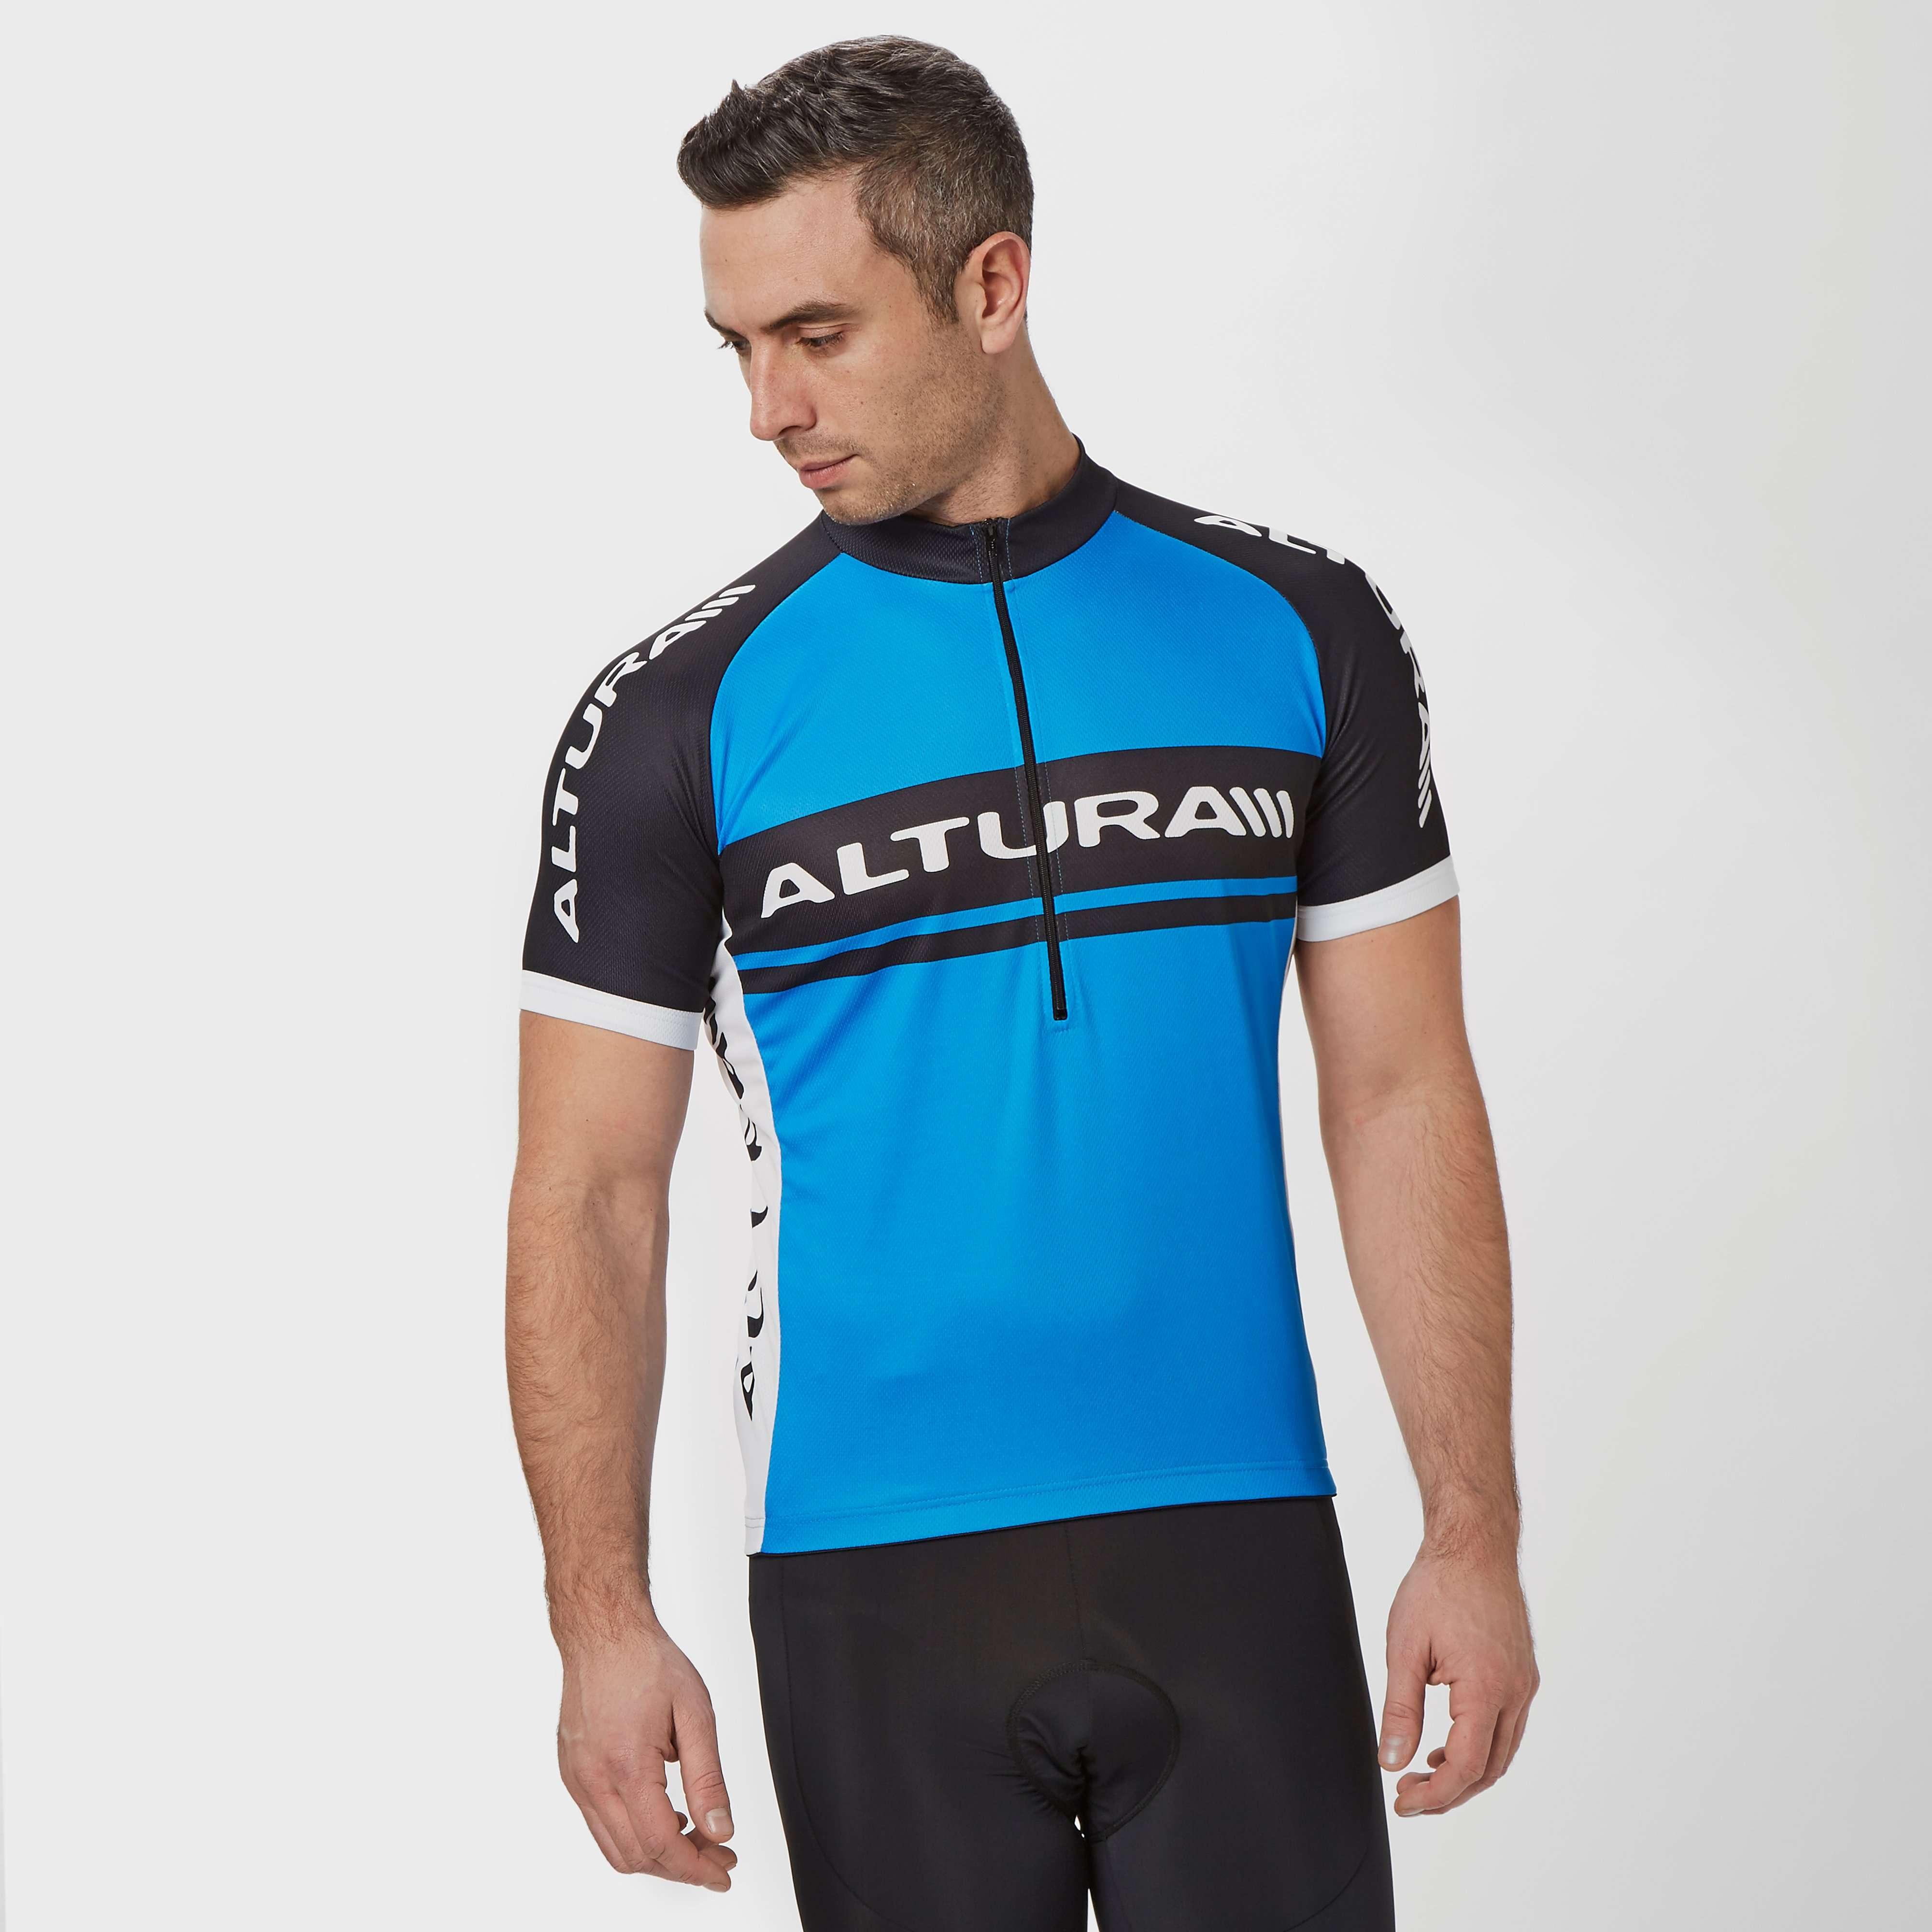 ALTURA Men's Team Short Sleeve Jersey